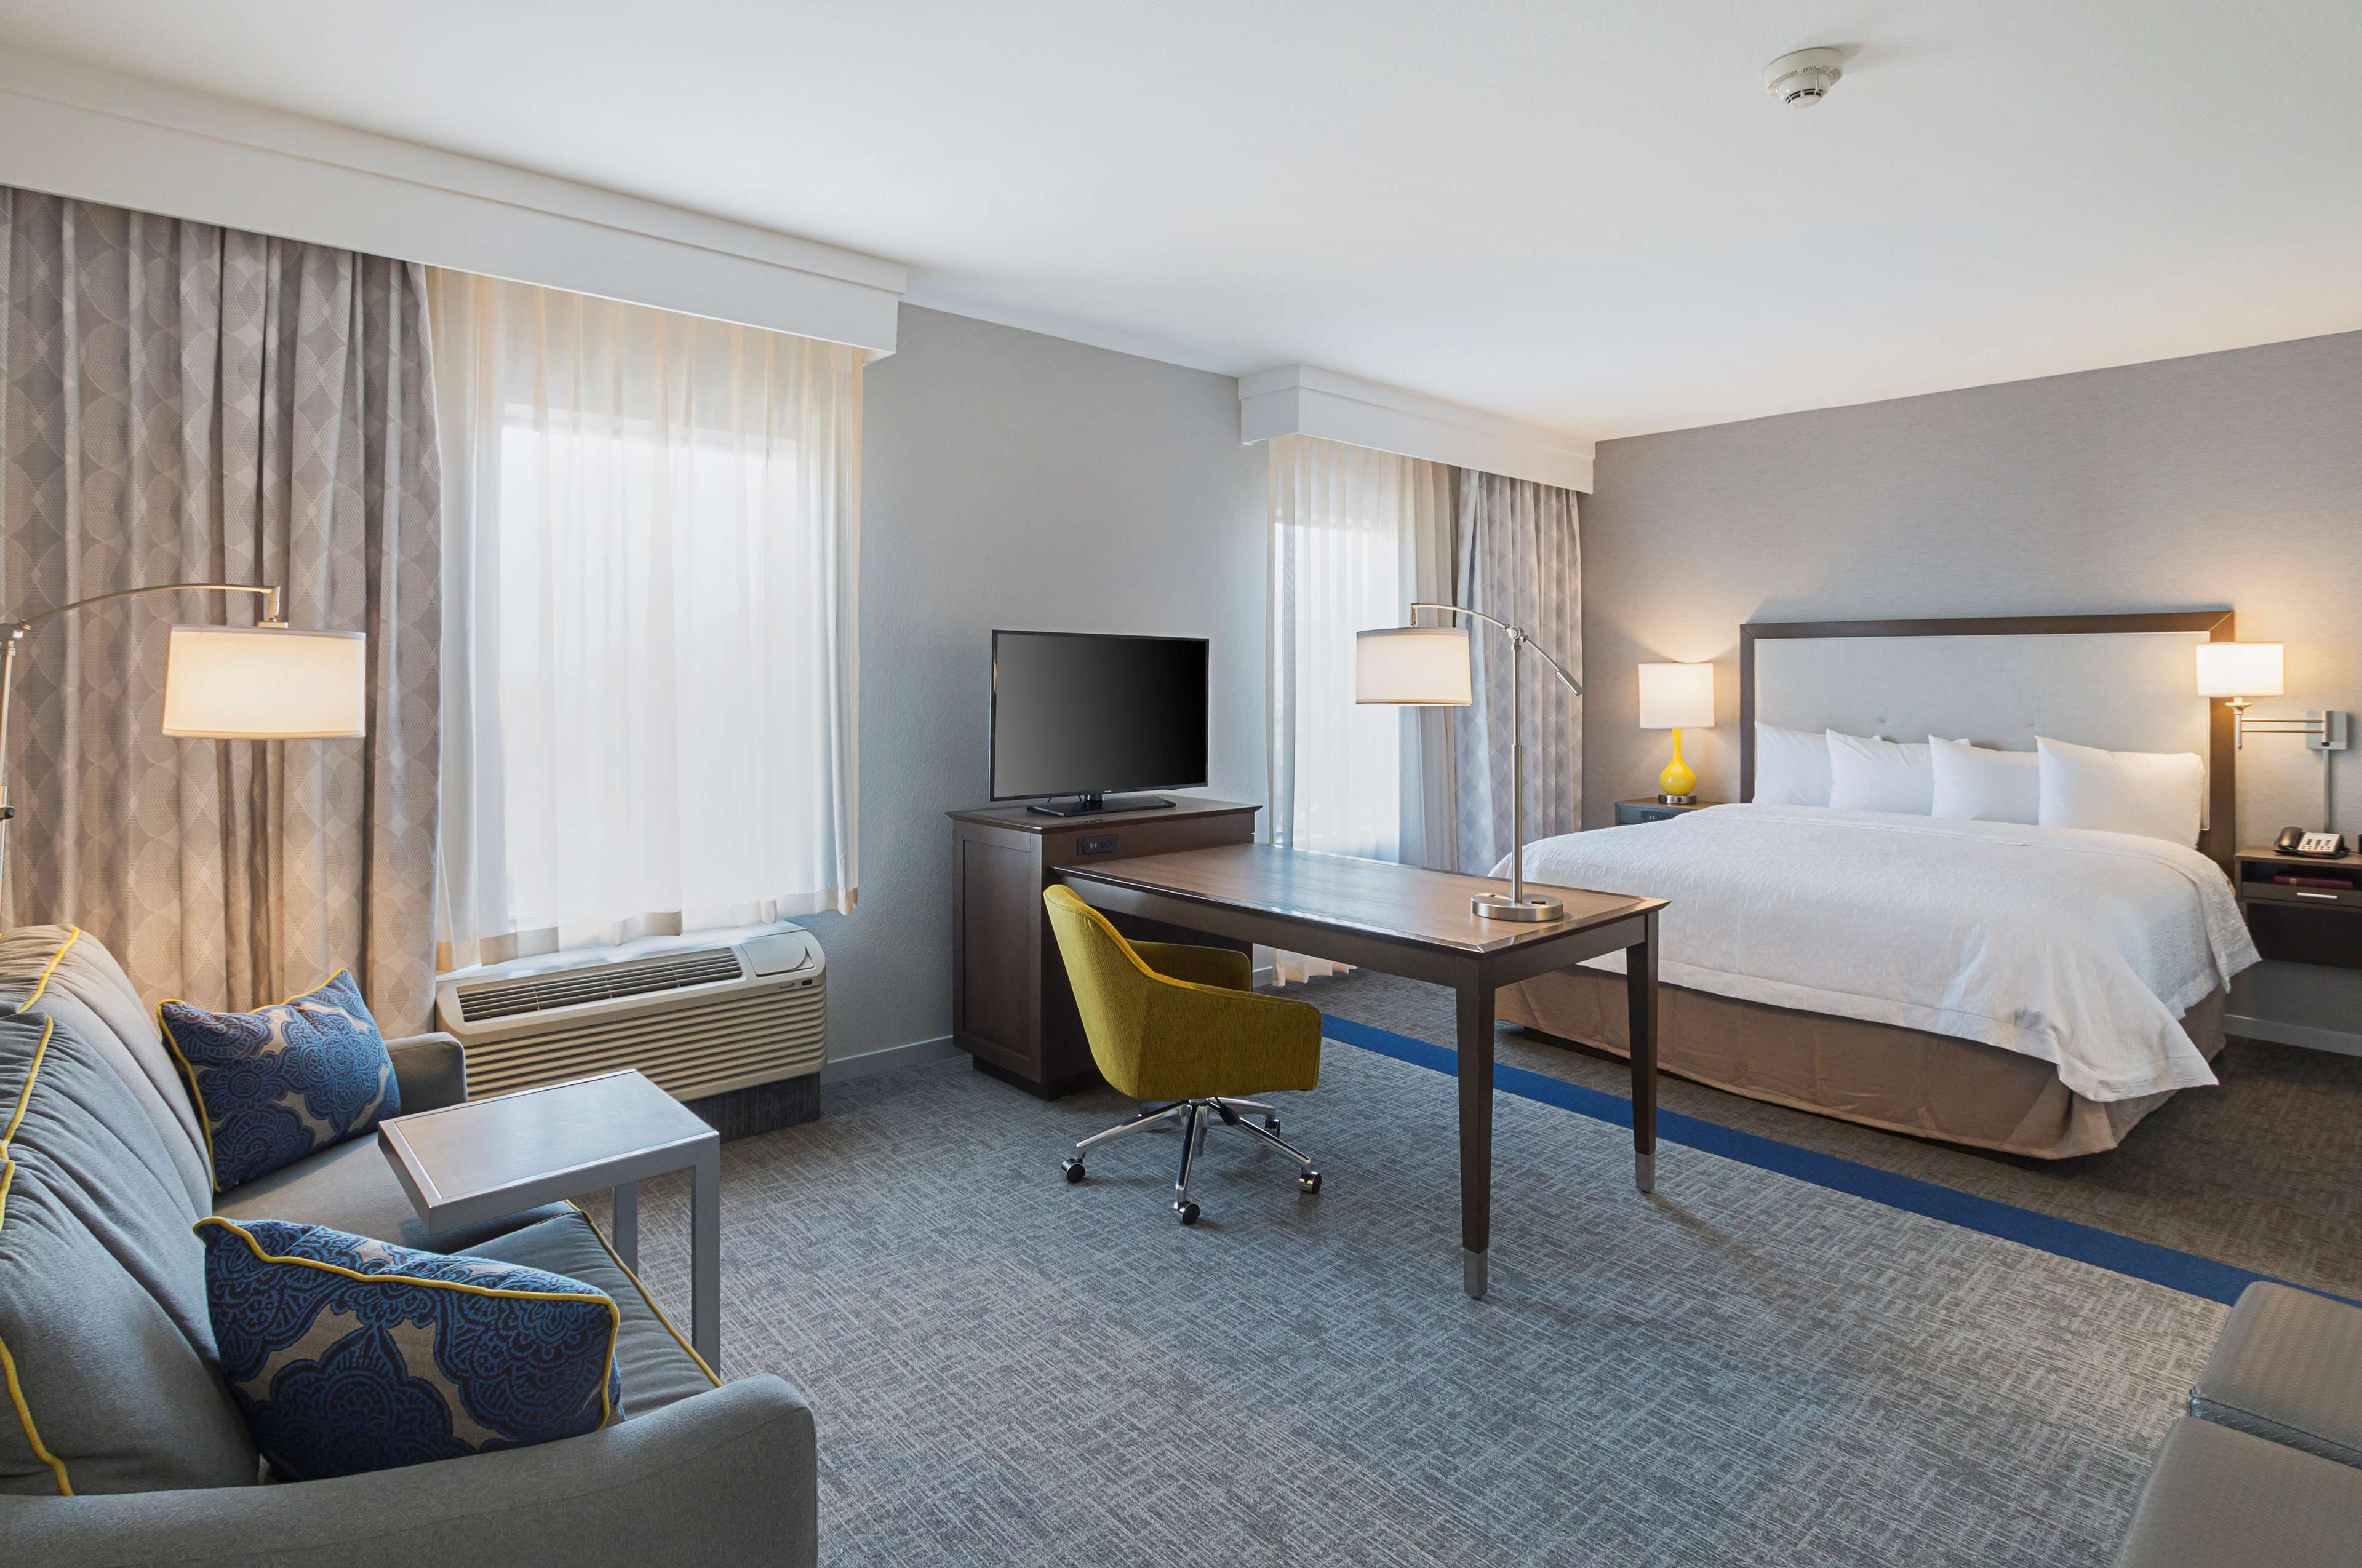 Hampton Inn & Suites Colleyville DFW West image 26